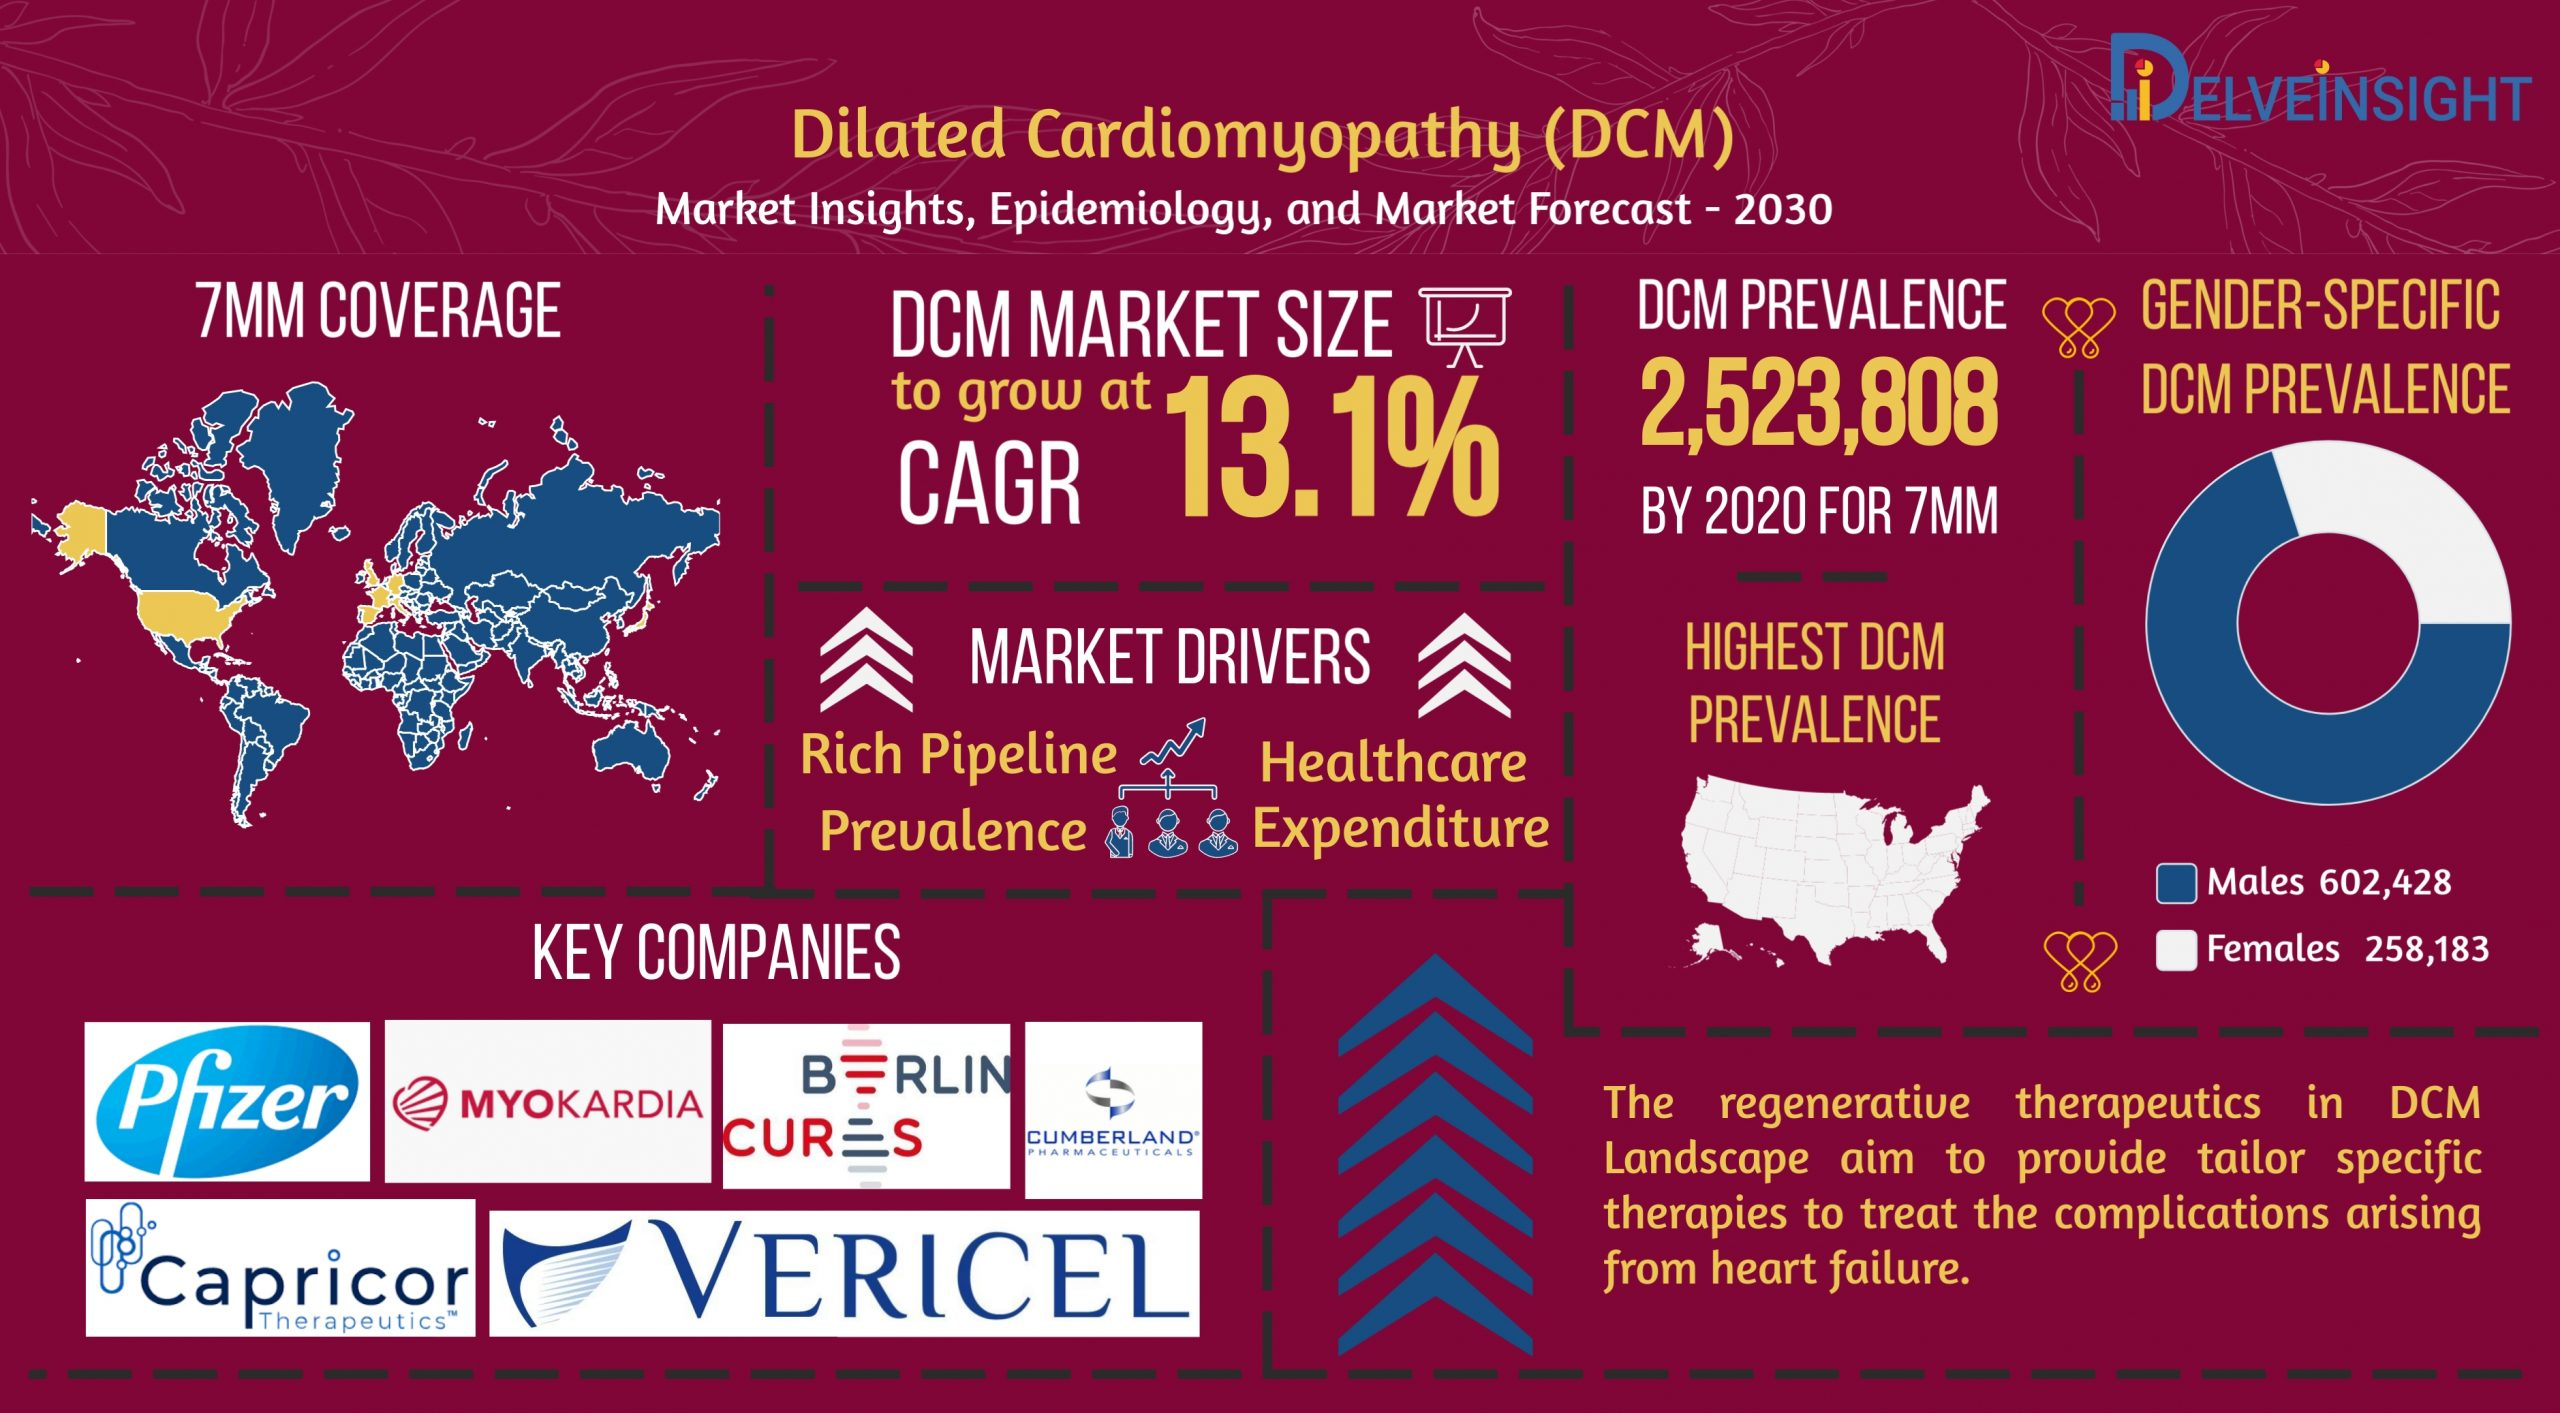 Dilated Cardiomyopathy Market | DCM Market